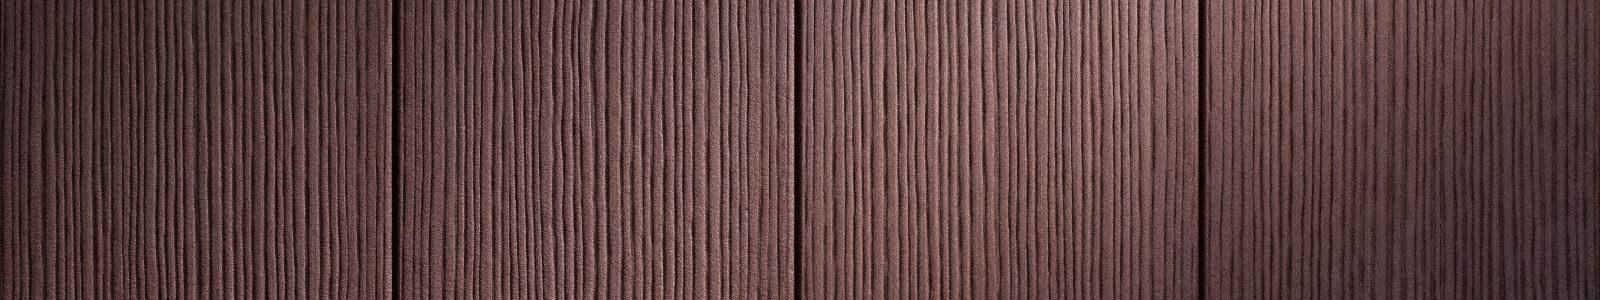 WoodPlastic® terasy max forest palisander